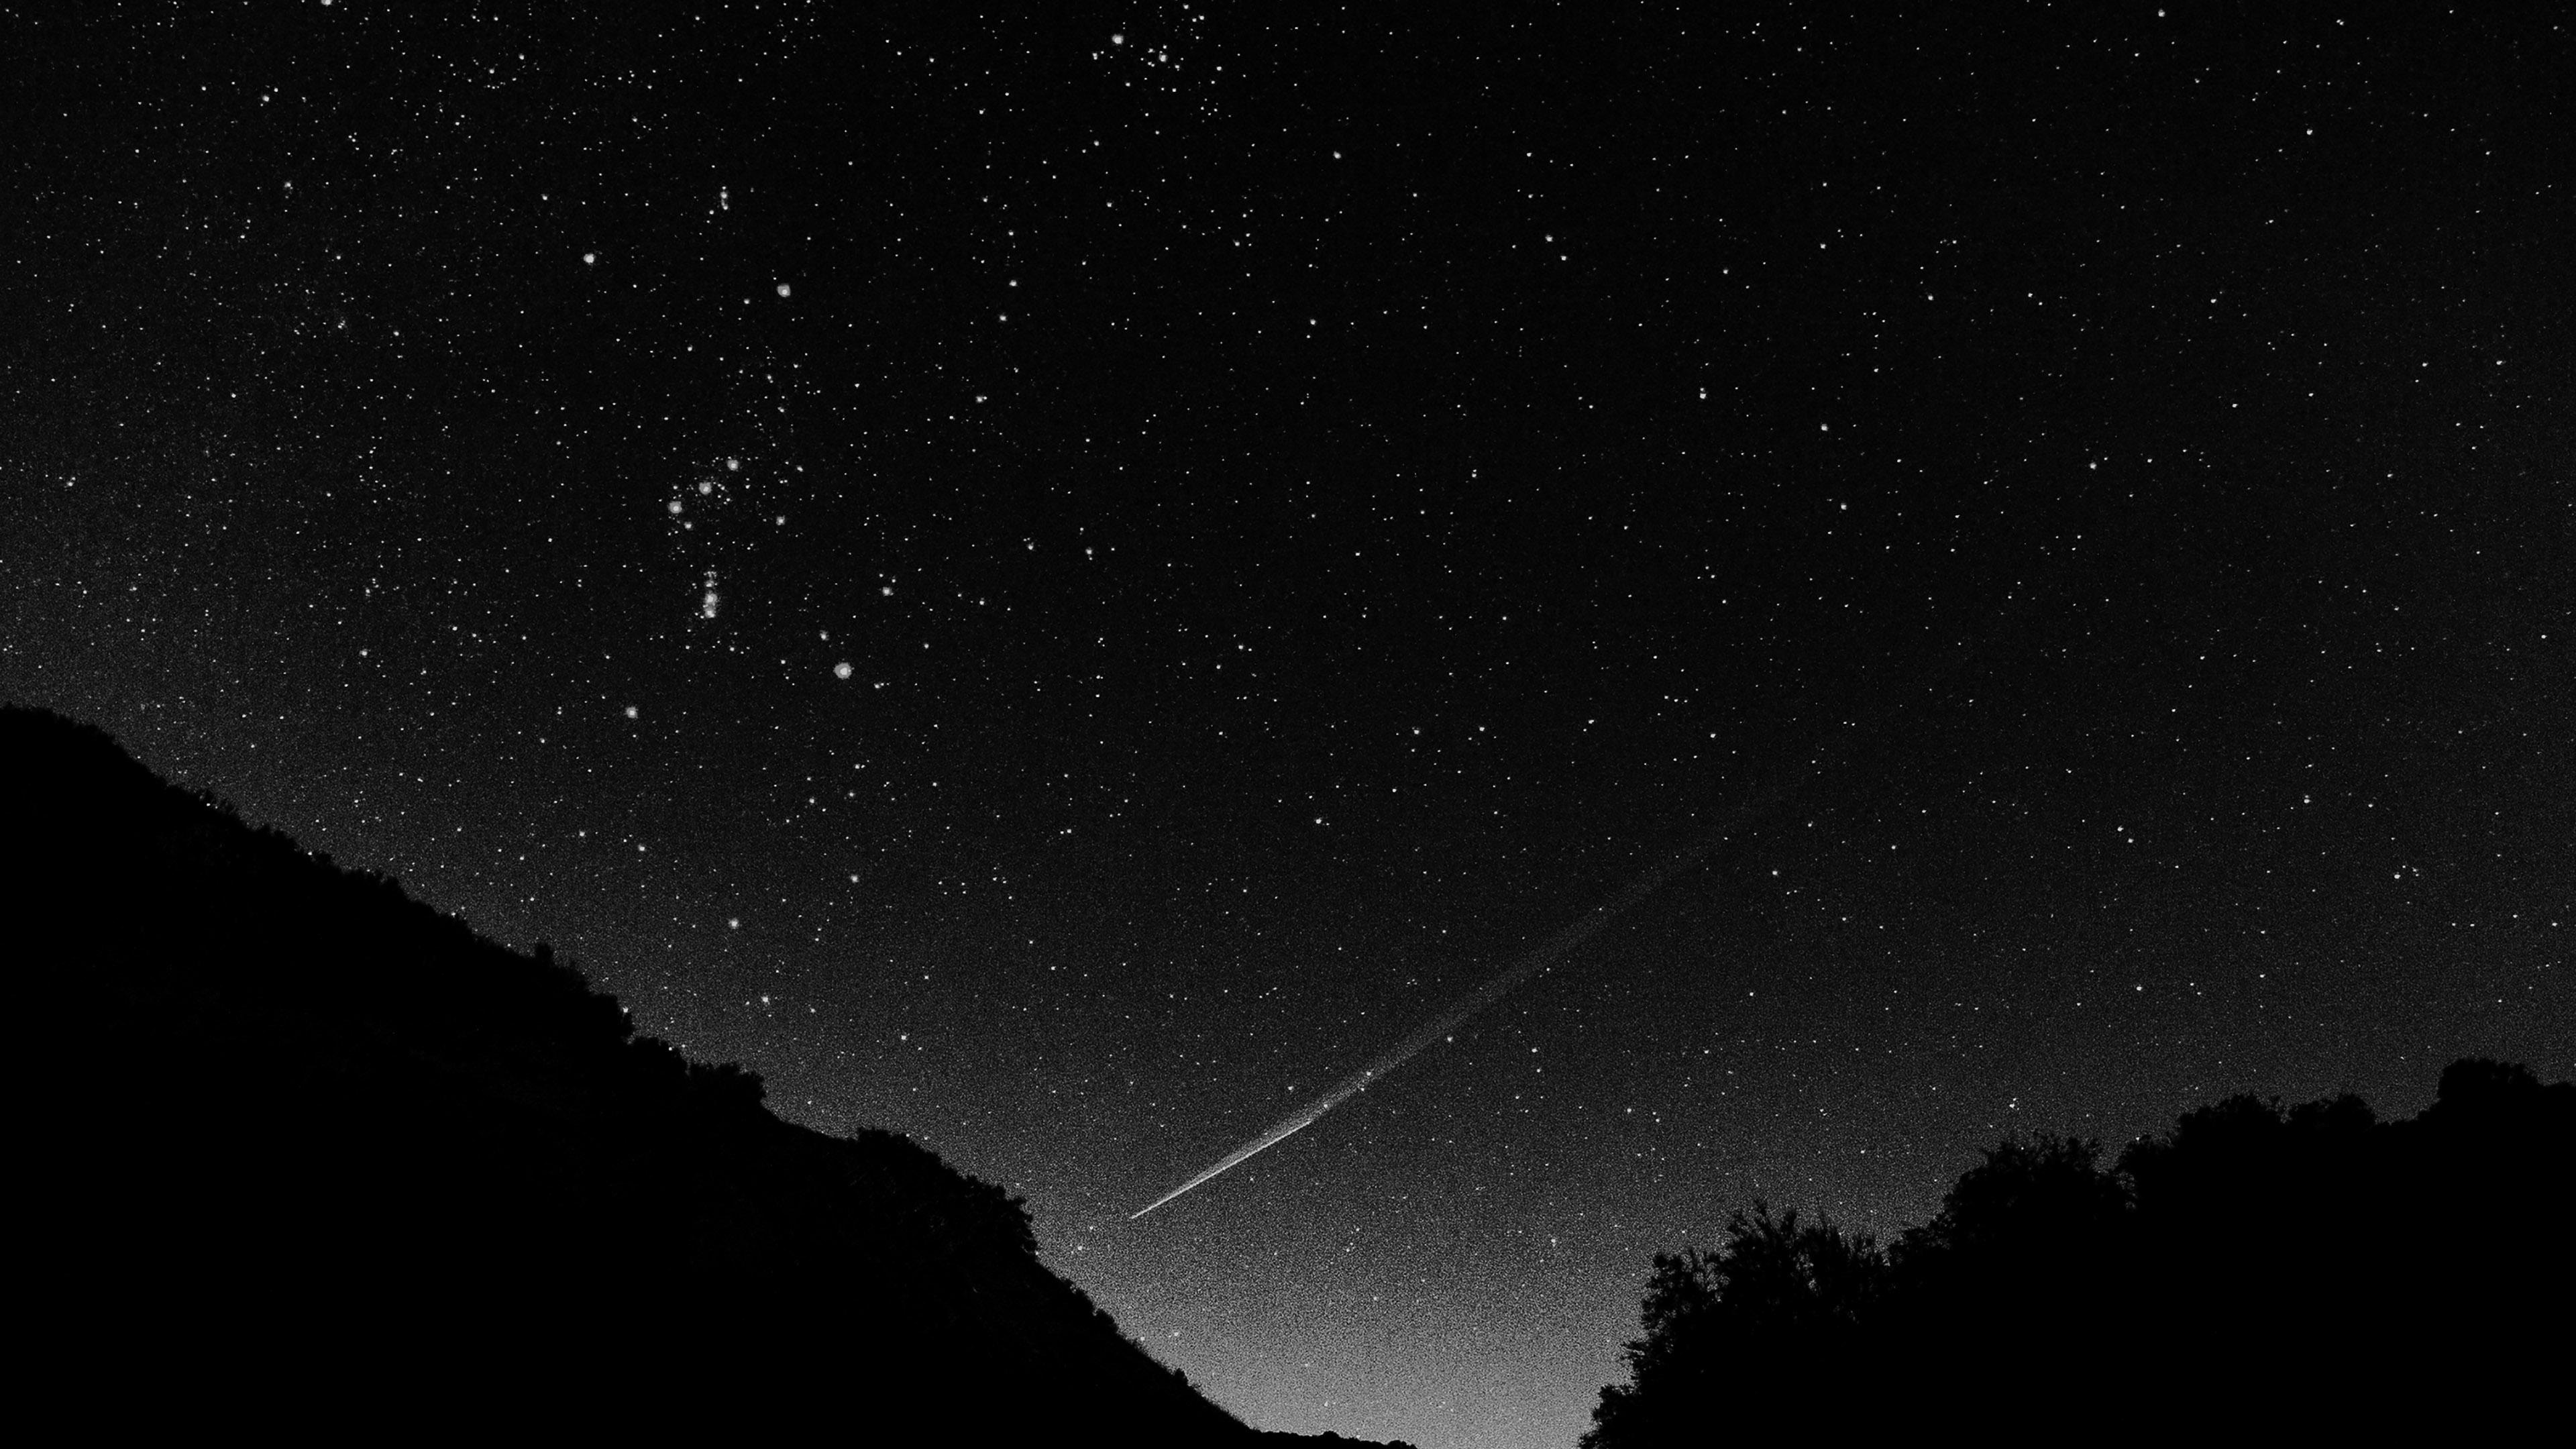 Mg37 Astronomy Space Black Sky Night Beautiful Falling